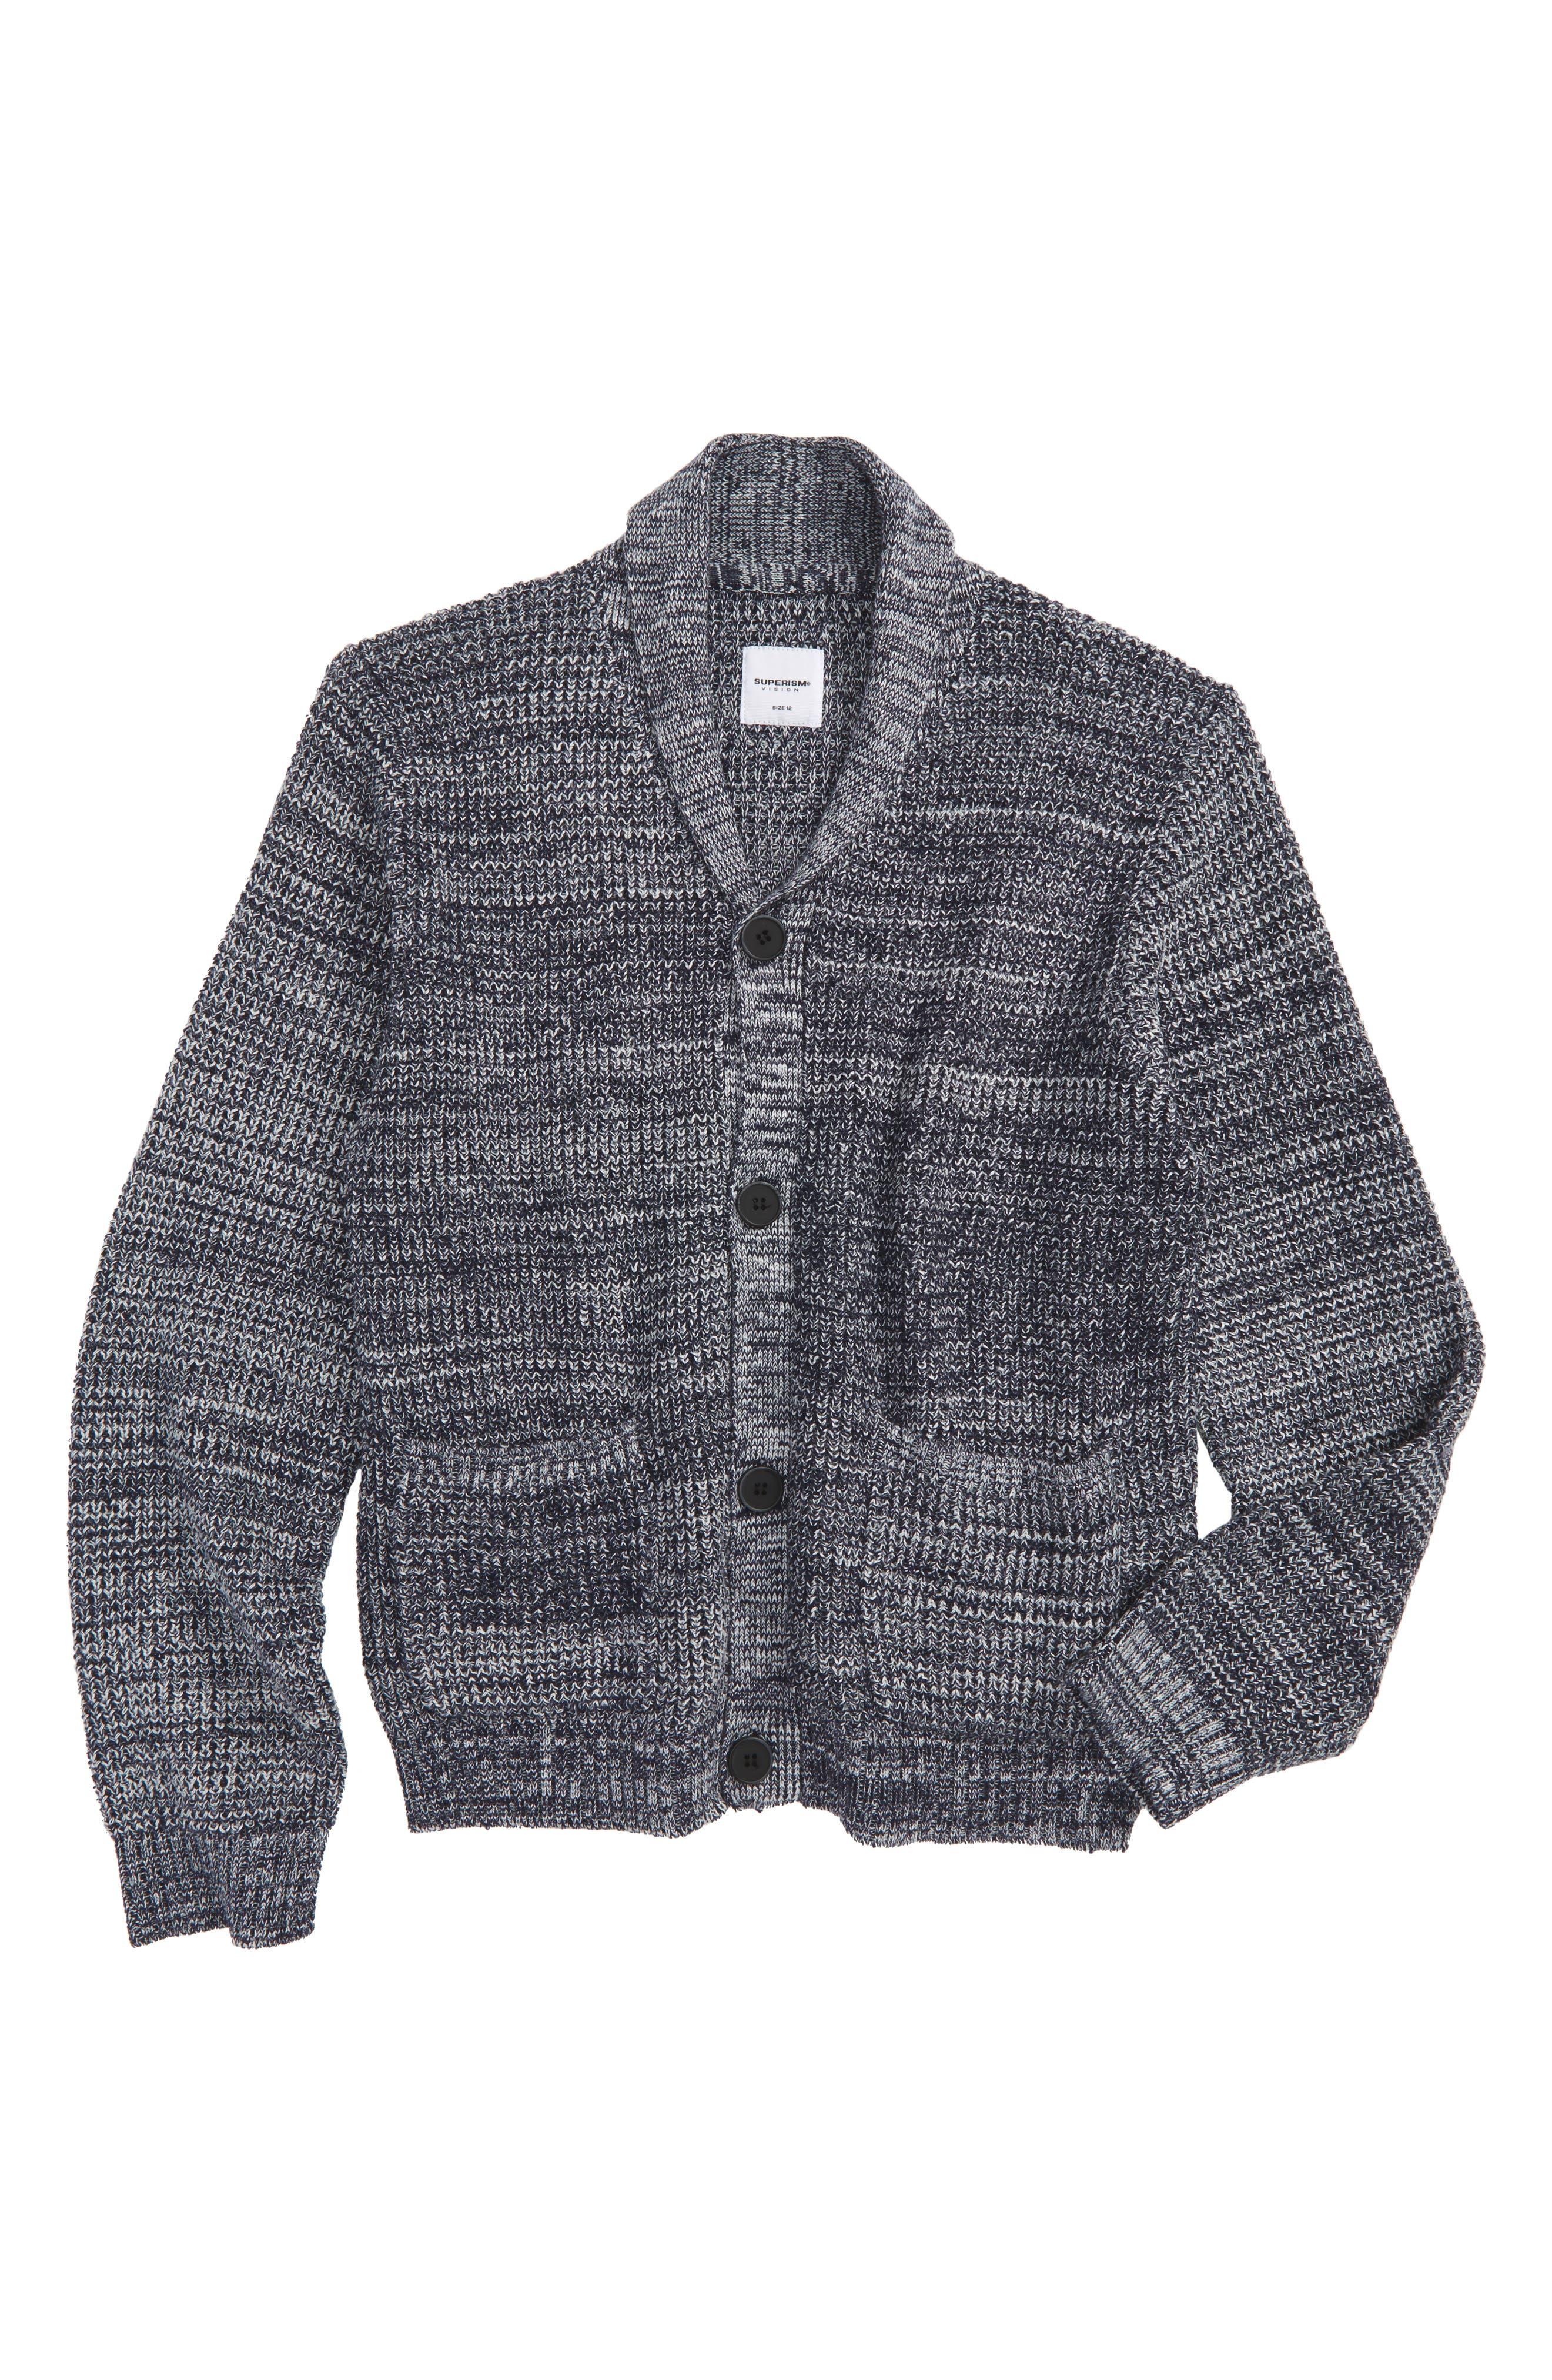 Alternate Image 1 Selected - Superism Cruz Cardigan Sweater (Big Boys)